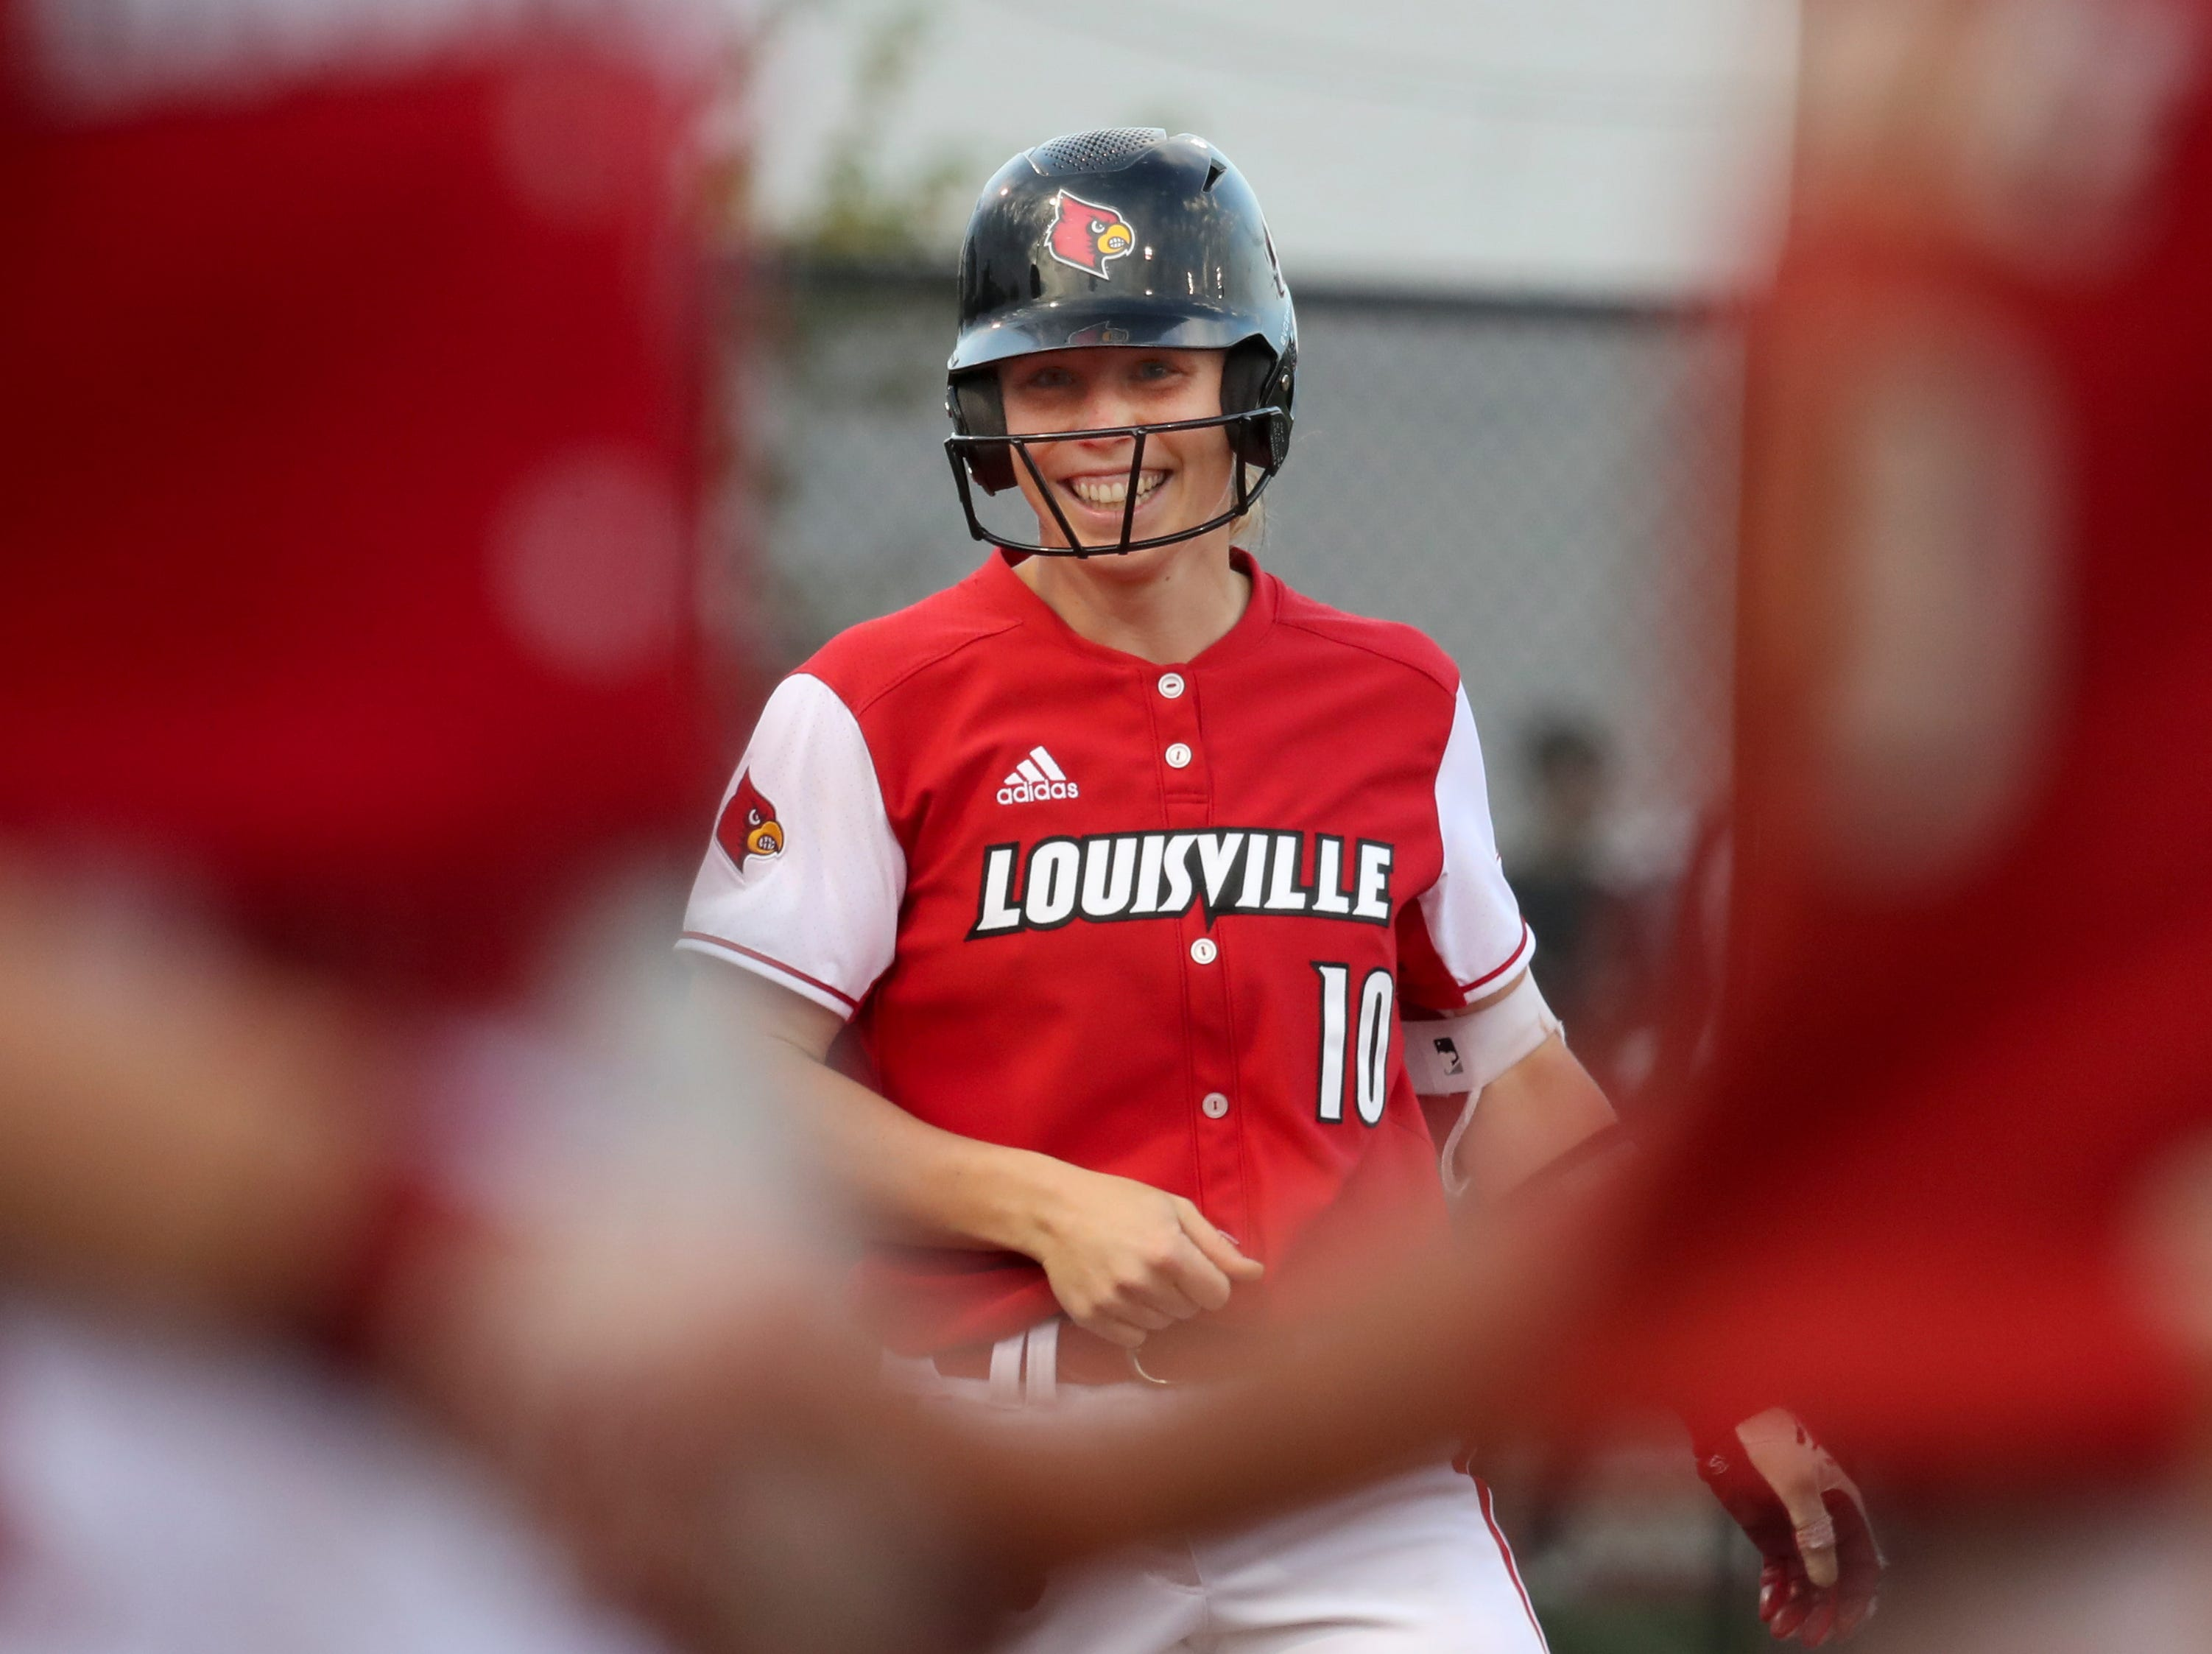 Louisville's Megan Hensley celebrates after smashing a 2 rbi triple against Kentucky on April 17.